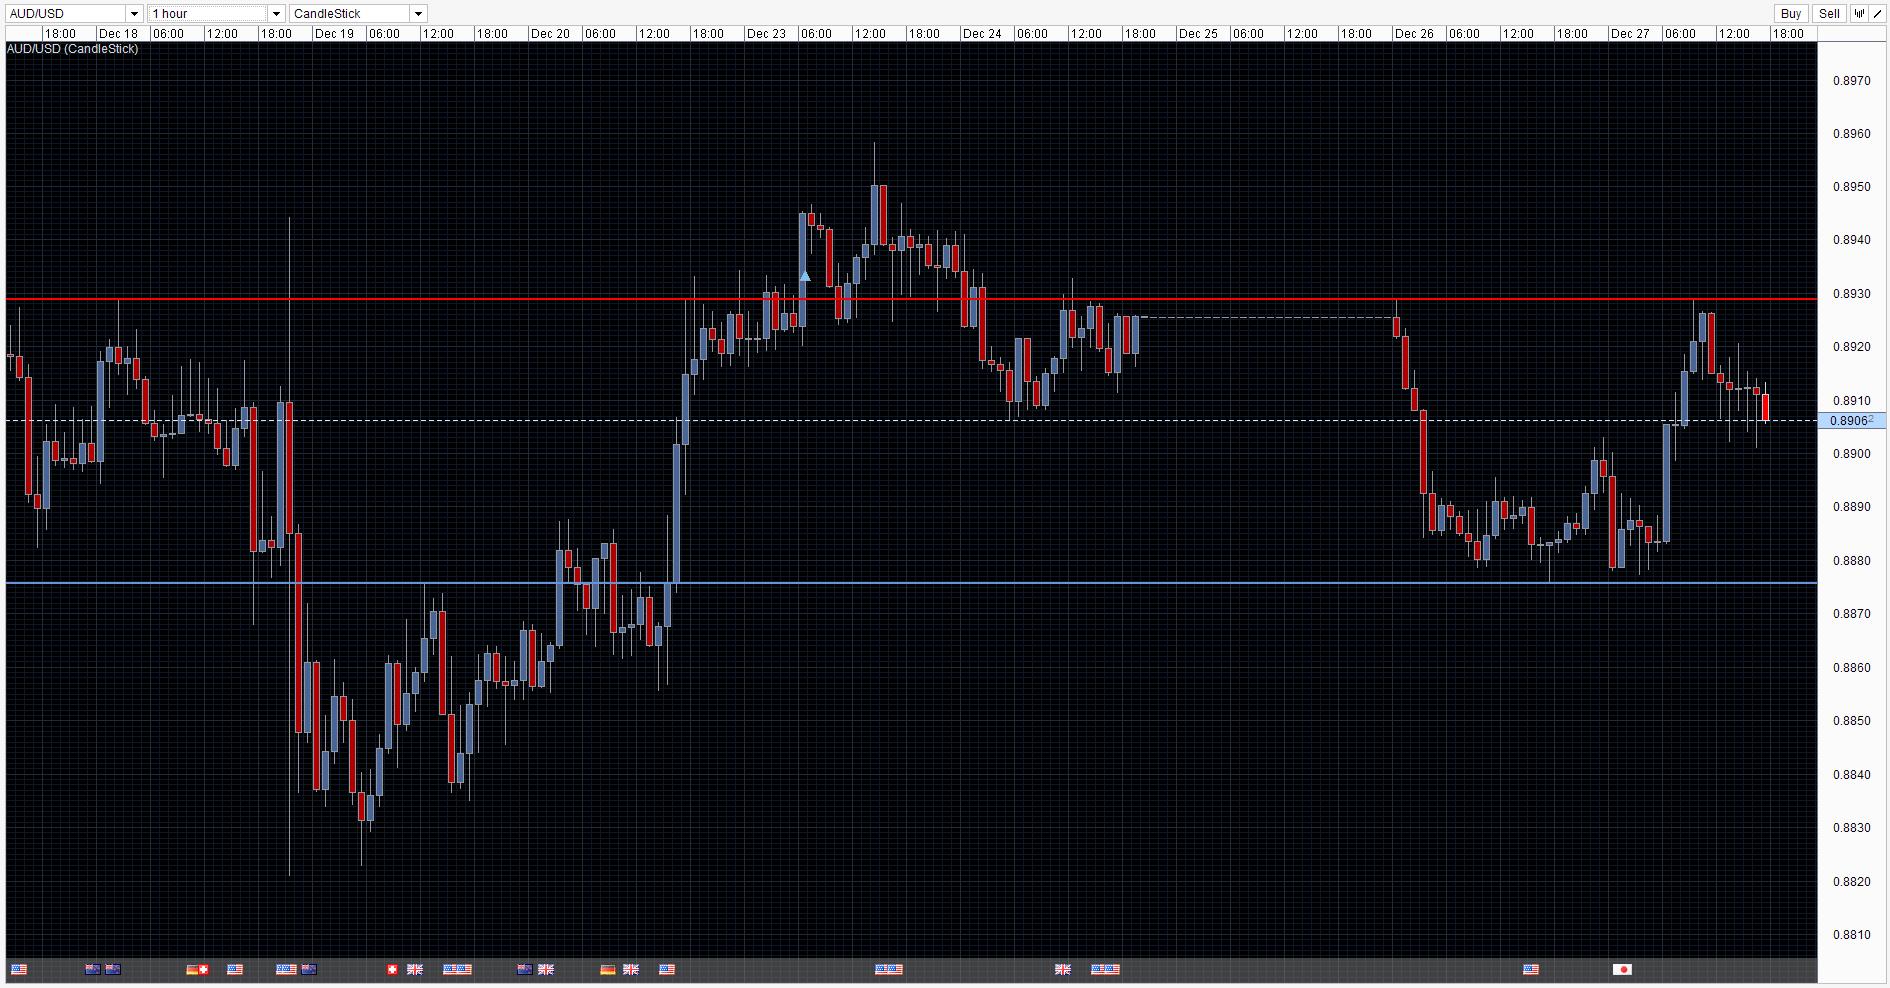 AUD/USD Chart 27 Dec 2013